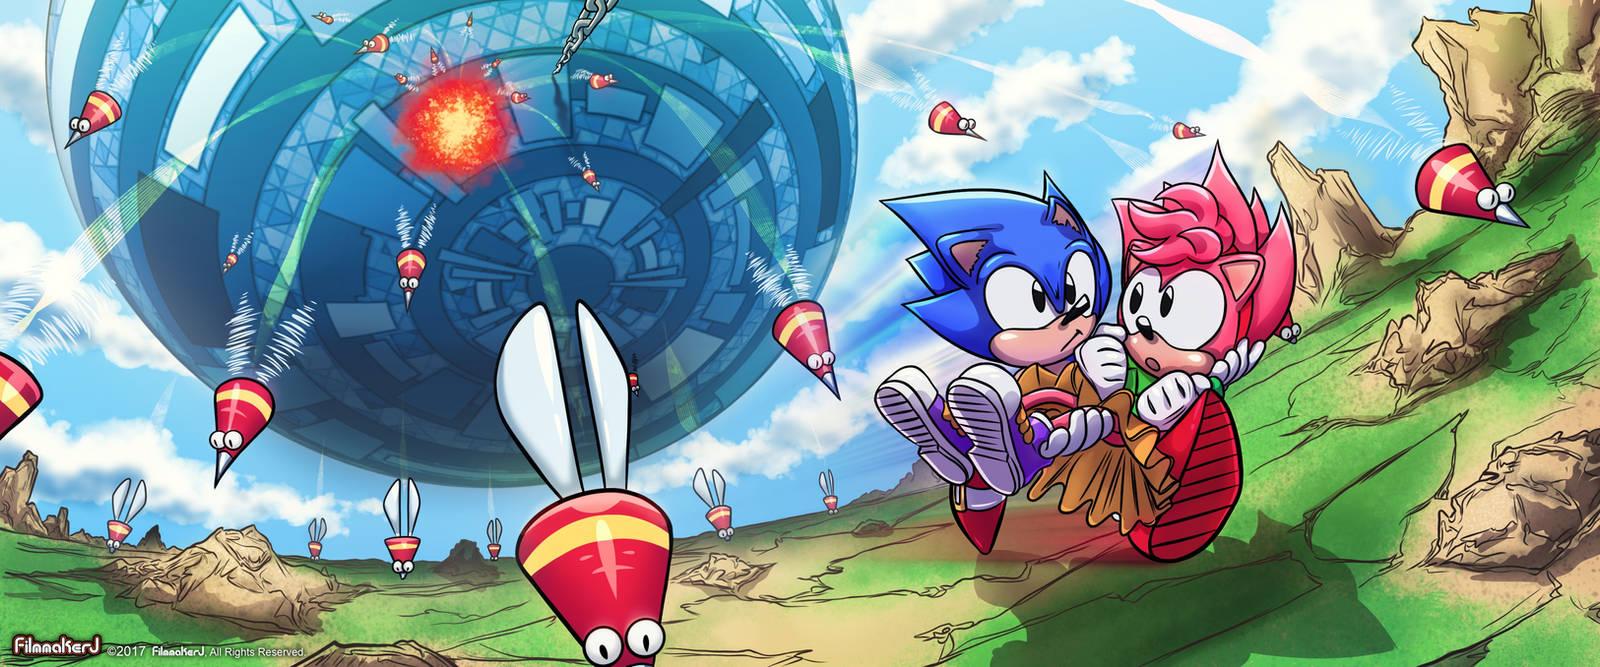 Sonic CD - My Hero by FilmmakerJ